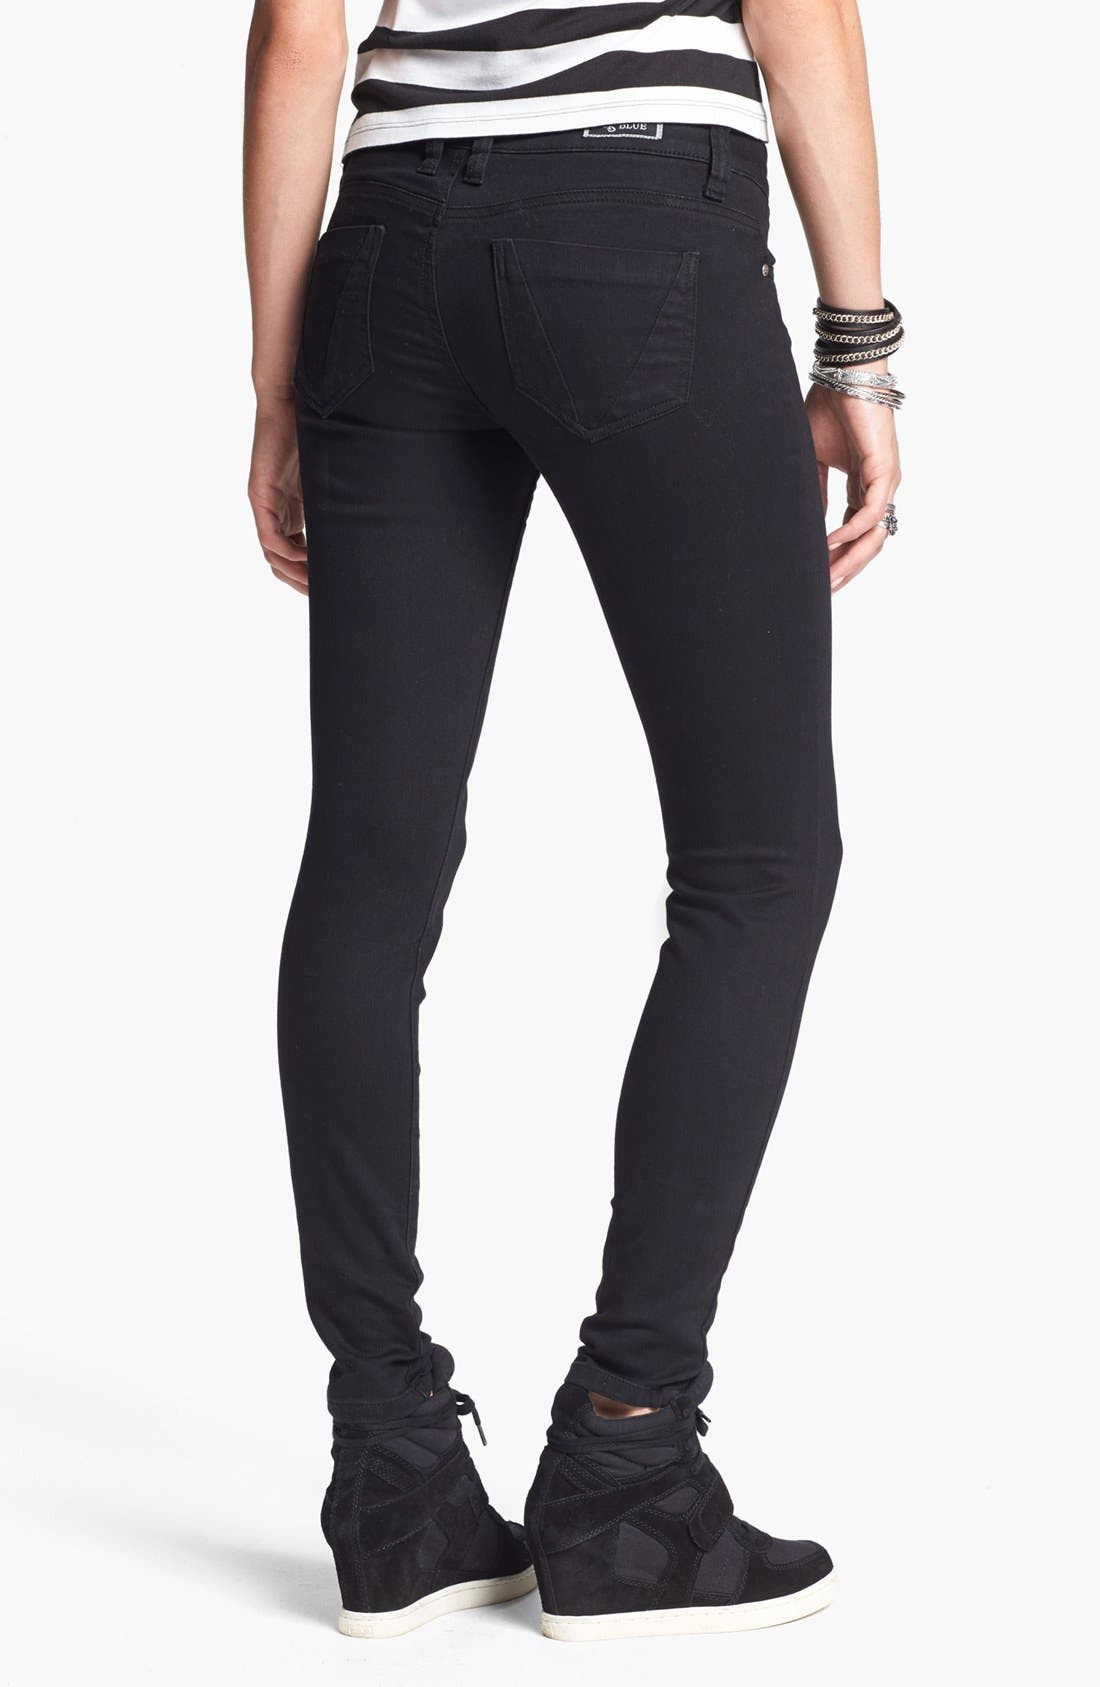 Alternate Image 2  - STS Blue Skinny Jeans (Black) (Juniors)